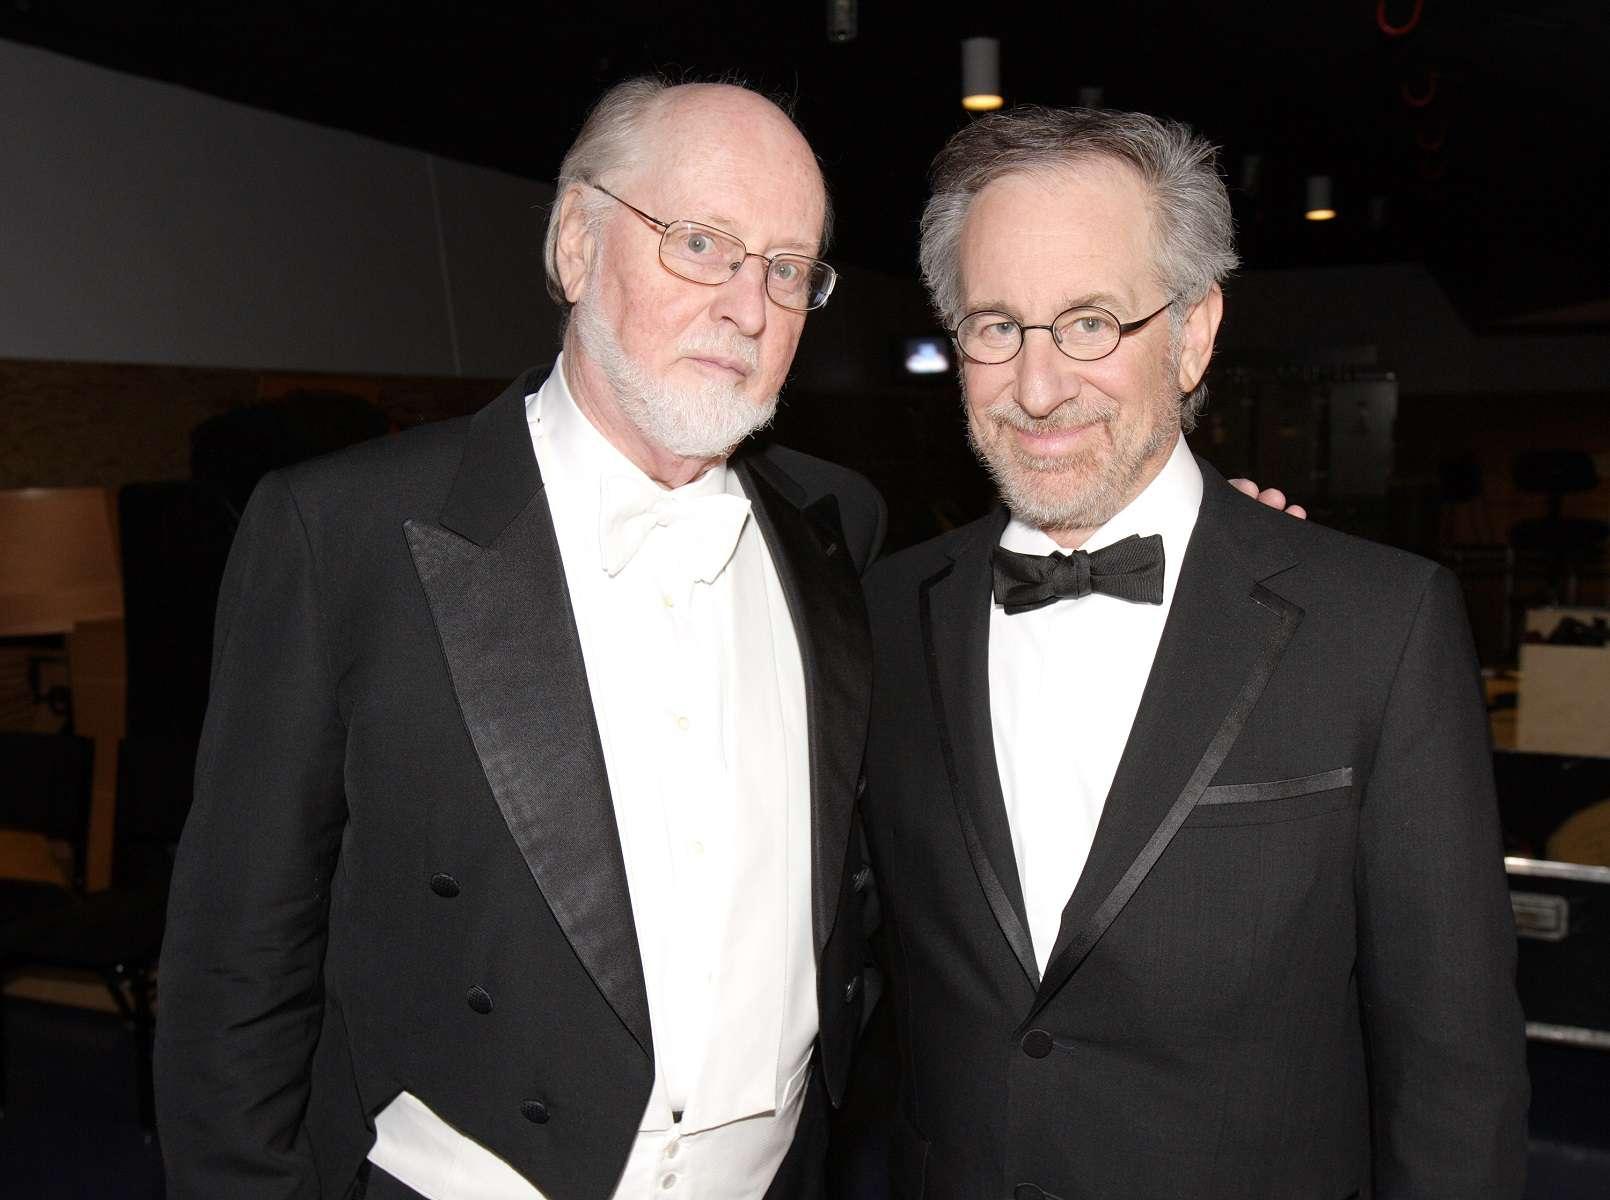 John Williams and Steven Spielberg